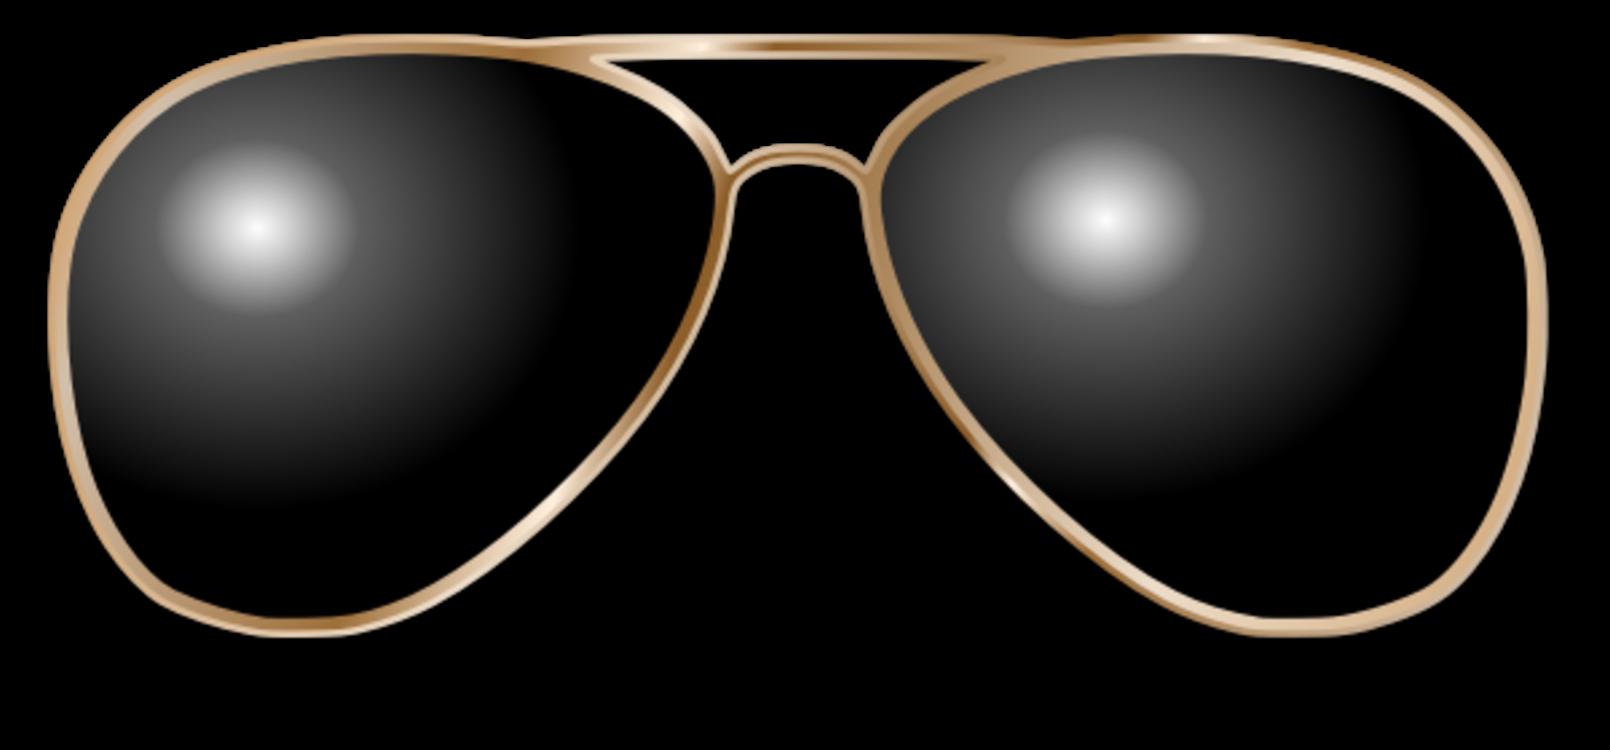 Computer Wallpaper,Sunglasses,Vision Care